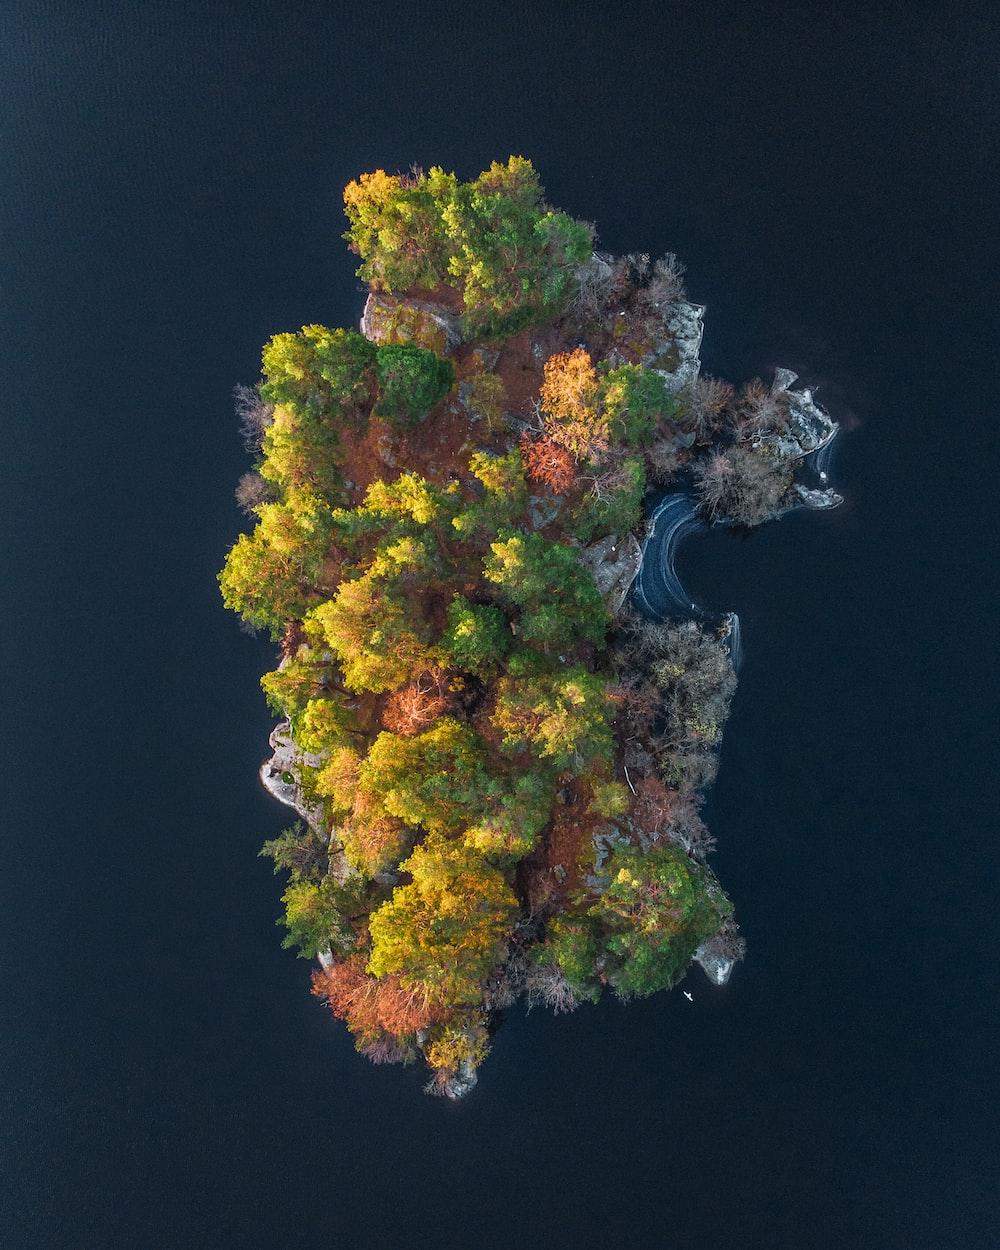 aerial photo of island